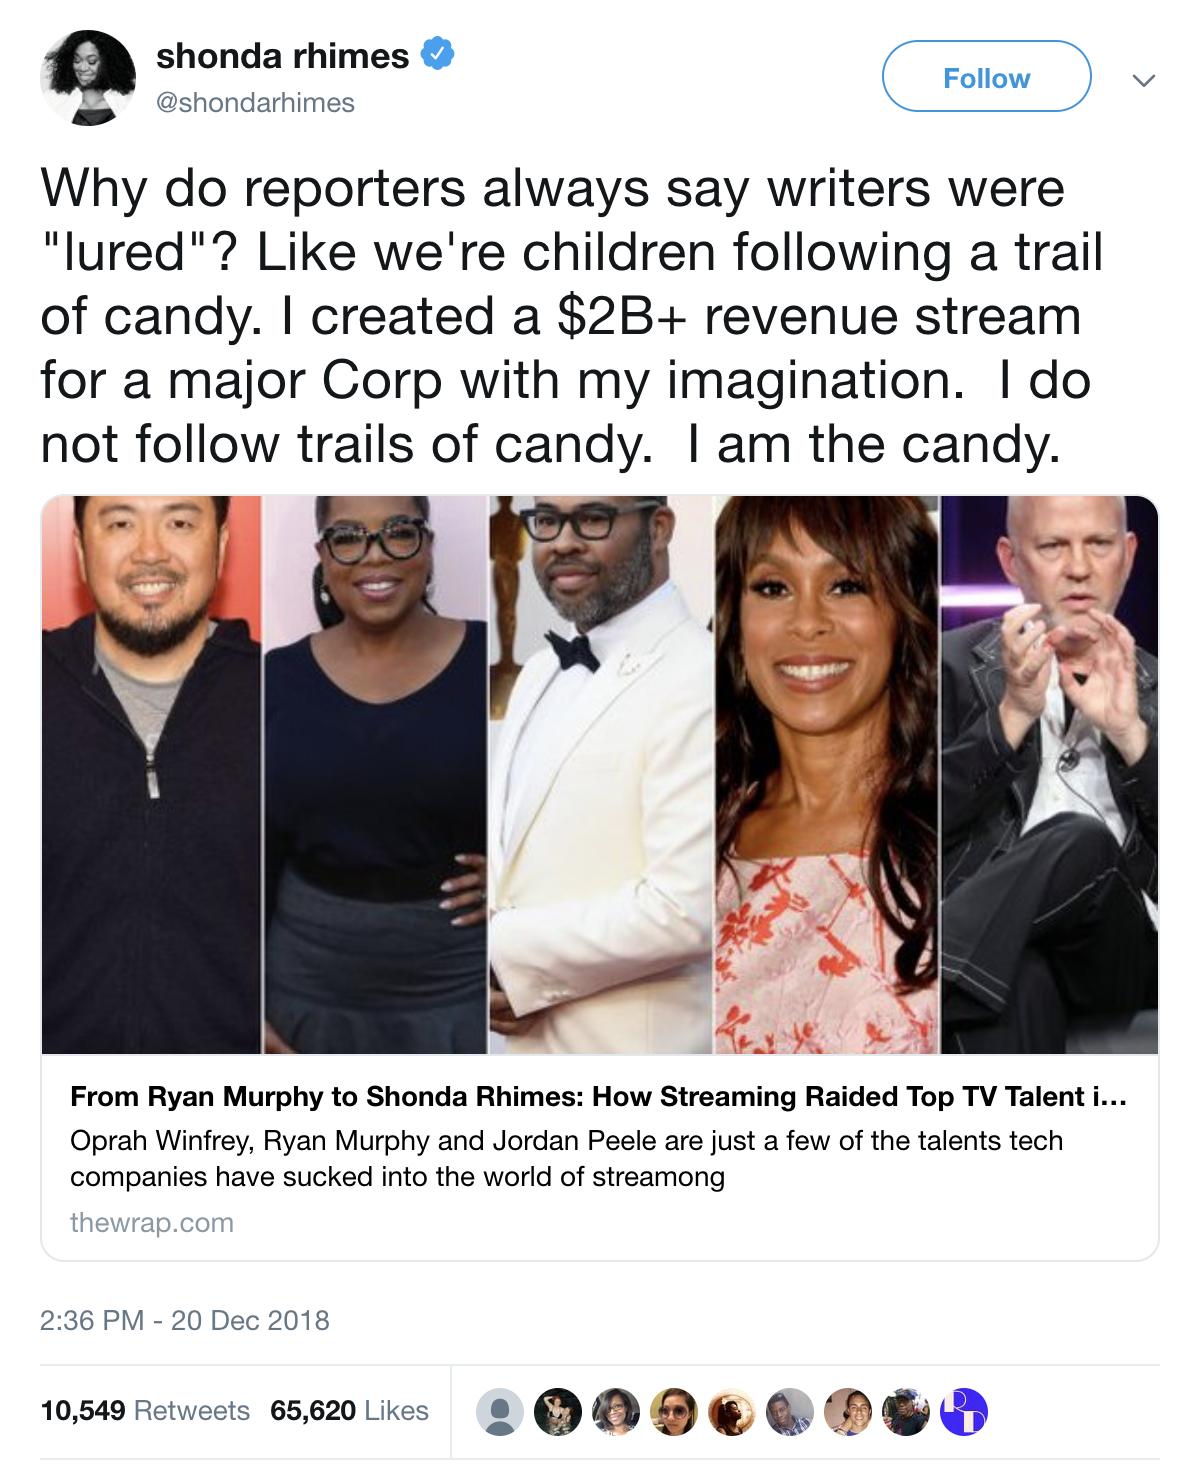 Shonda Rhimes on Twitter